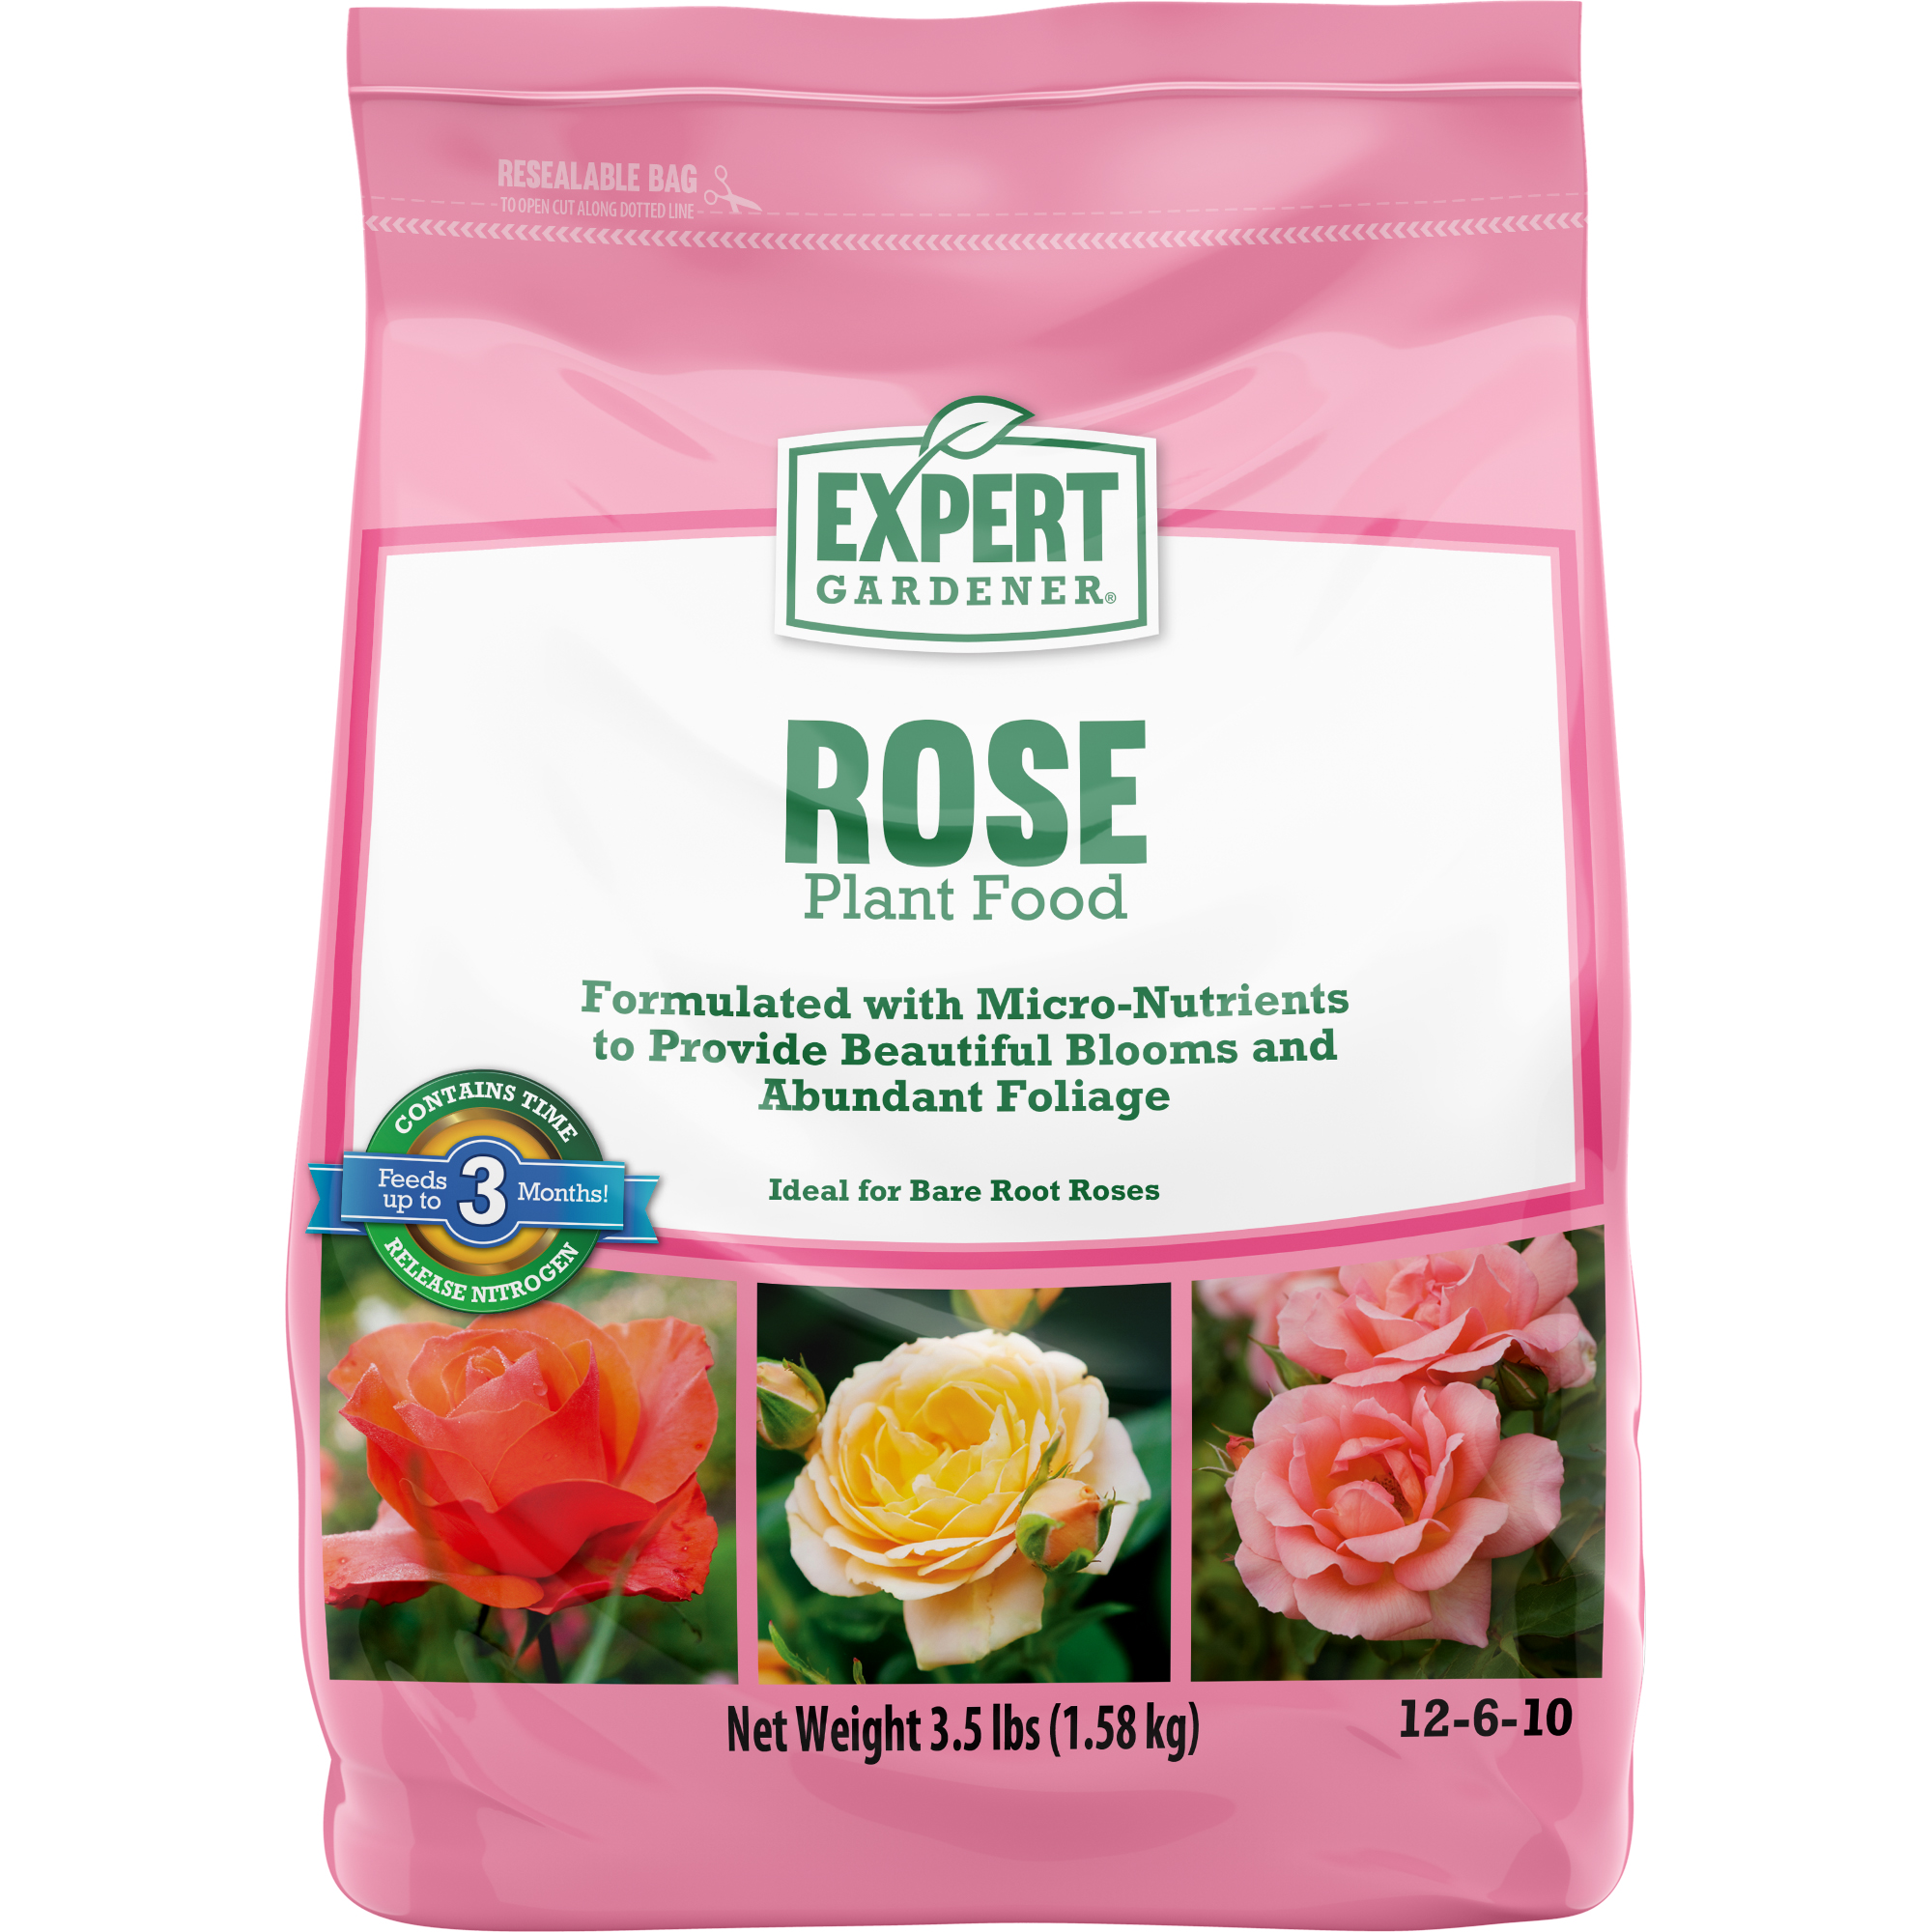 Expert Gardener Rose Plant Food 12-6-10, 3.5 lbs